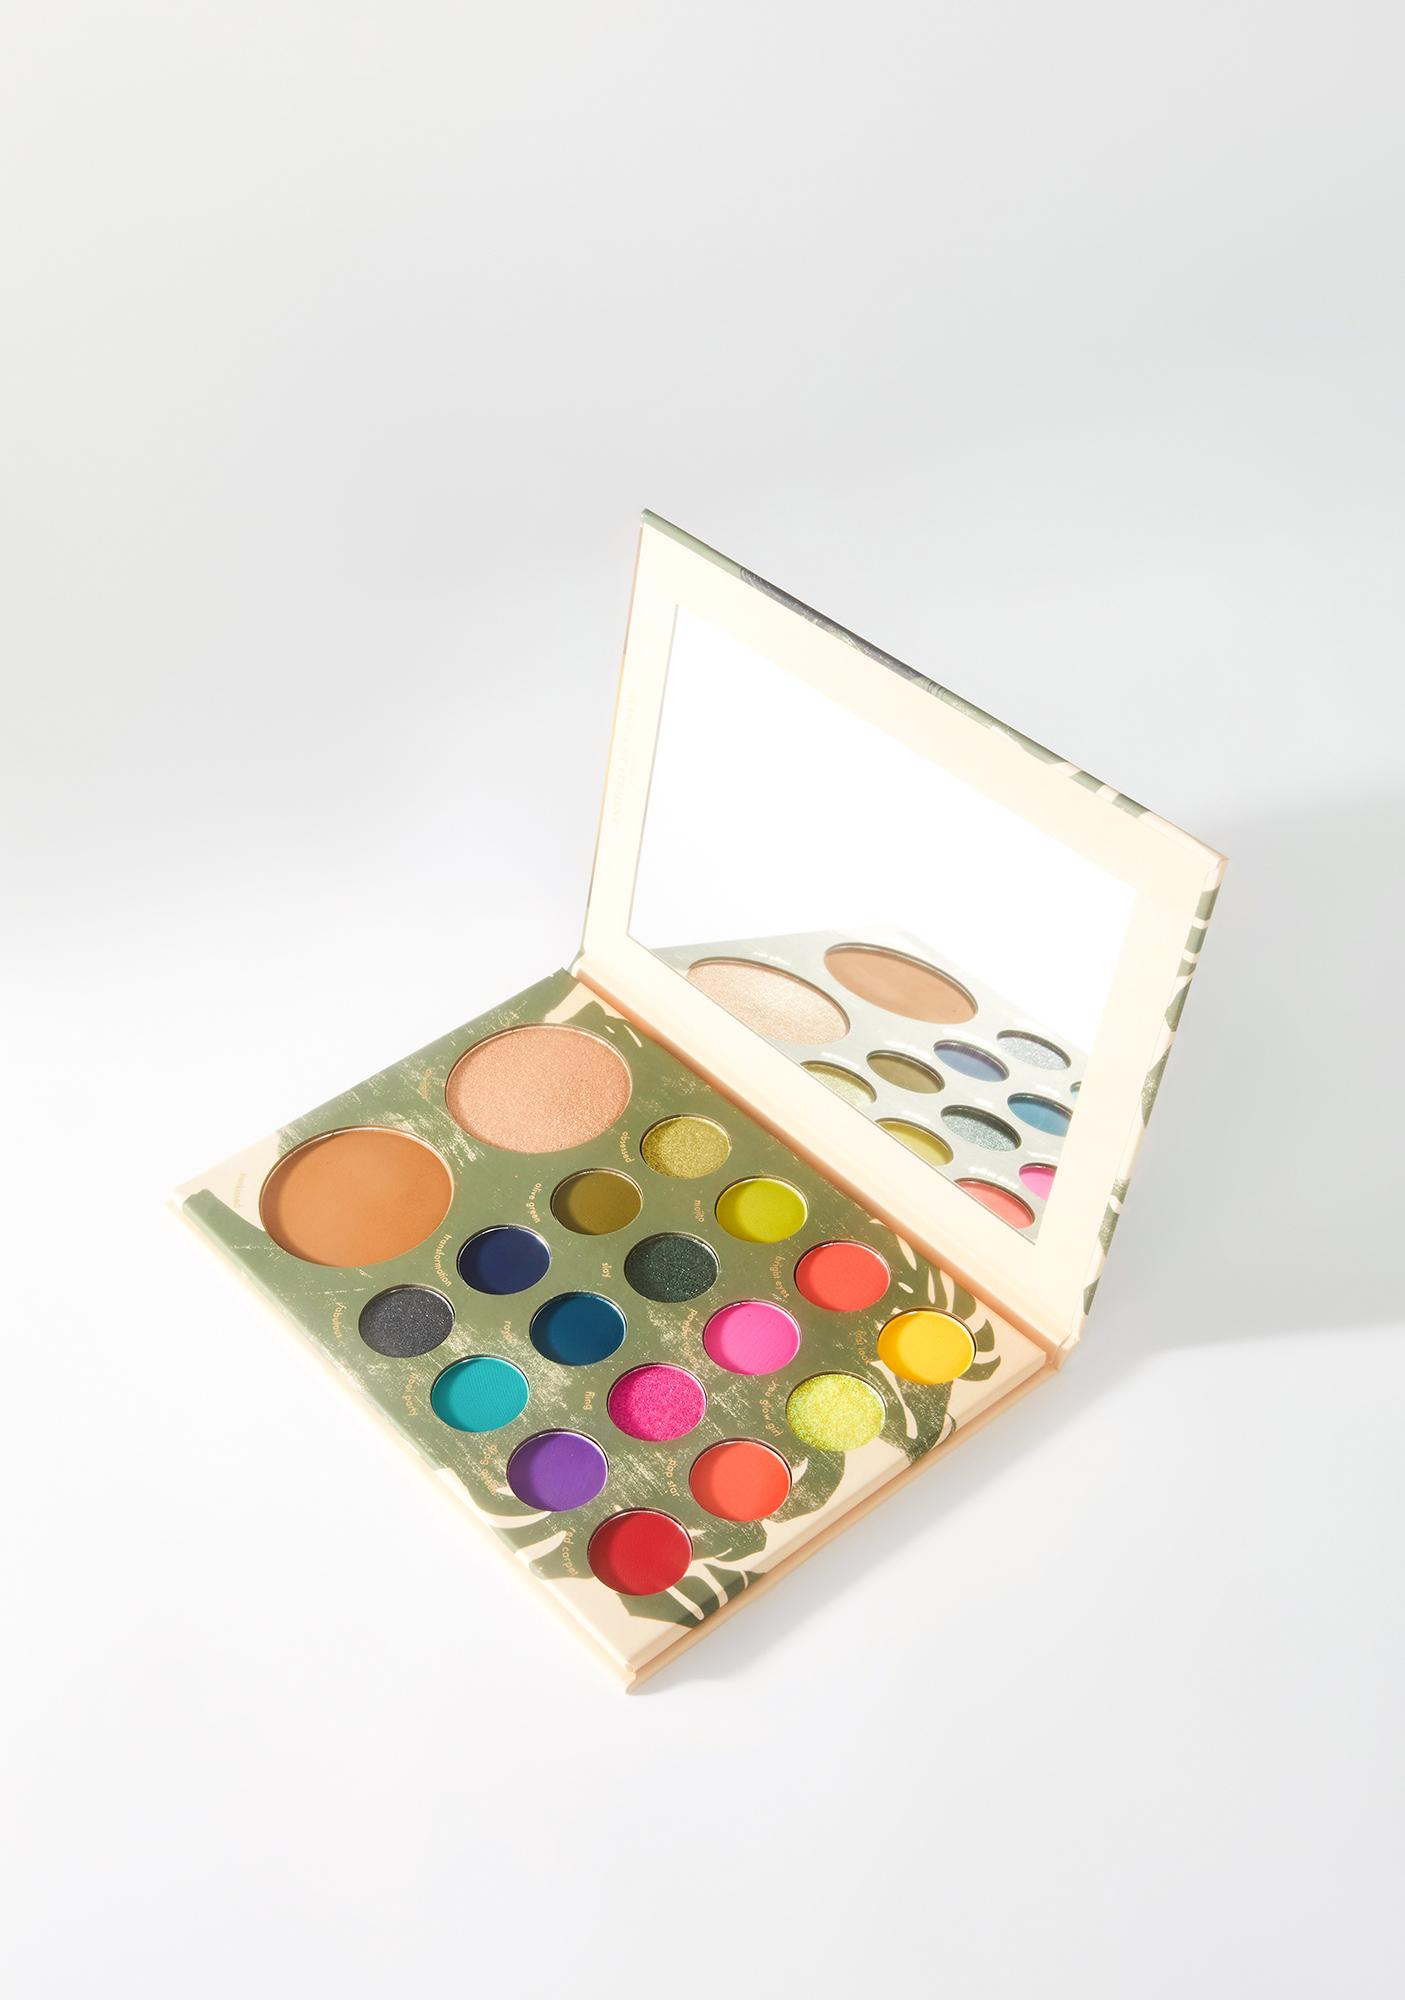 Kara Beauty Make A Statement 16 Eyeshadow Palette